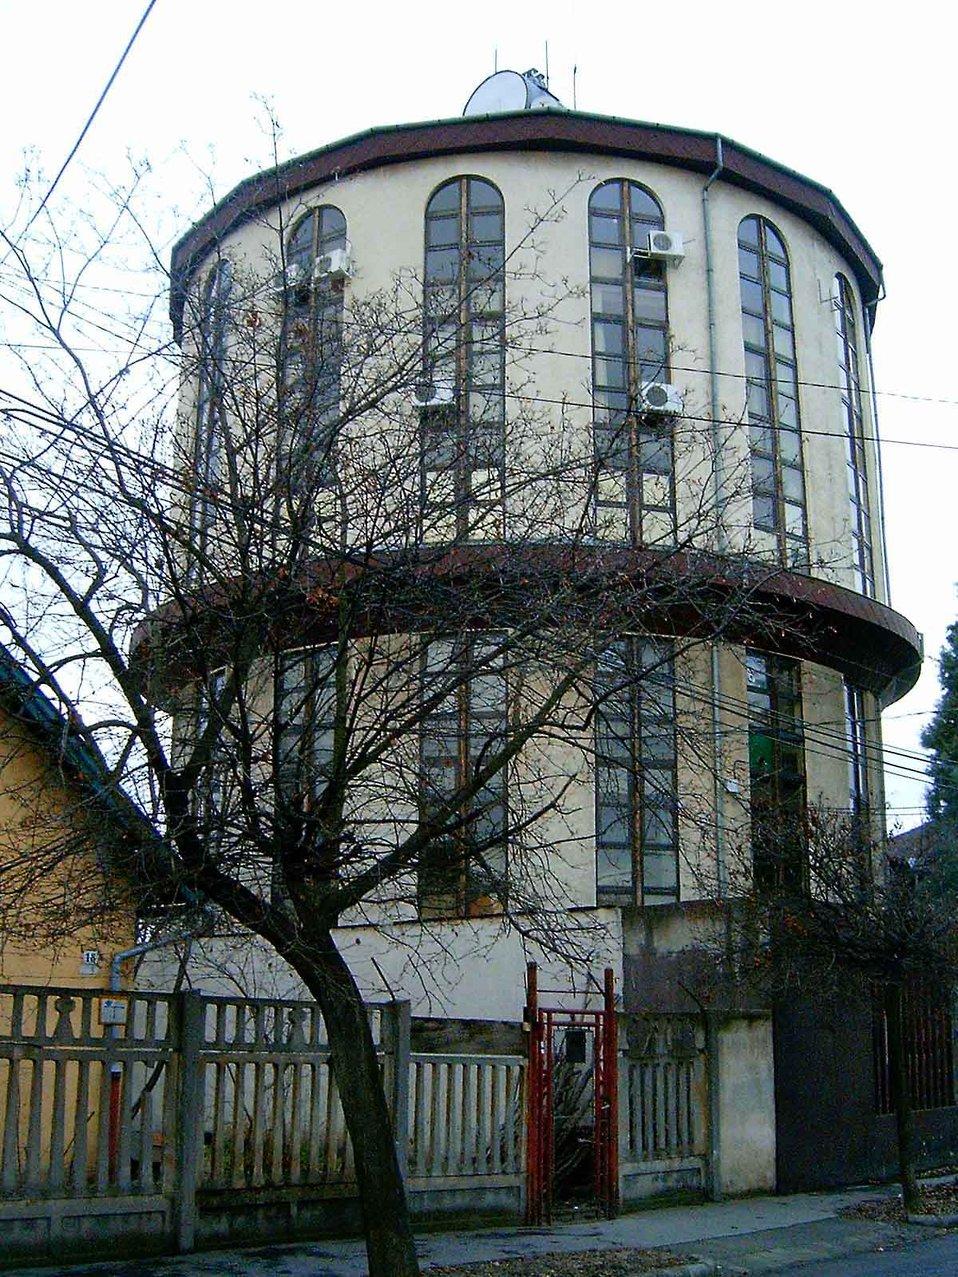 Magyar:  Kispesti víztorony Deutsch:  Wasserturm Kispest (18. Bezirk in Budapest) Watertower in Kispest (18th district in Budapest)